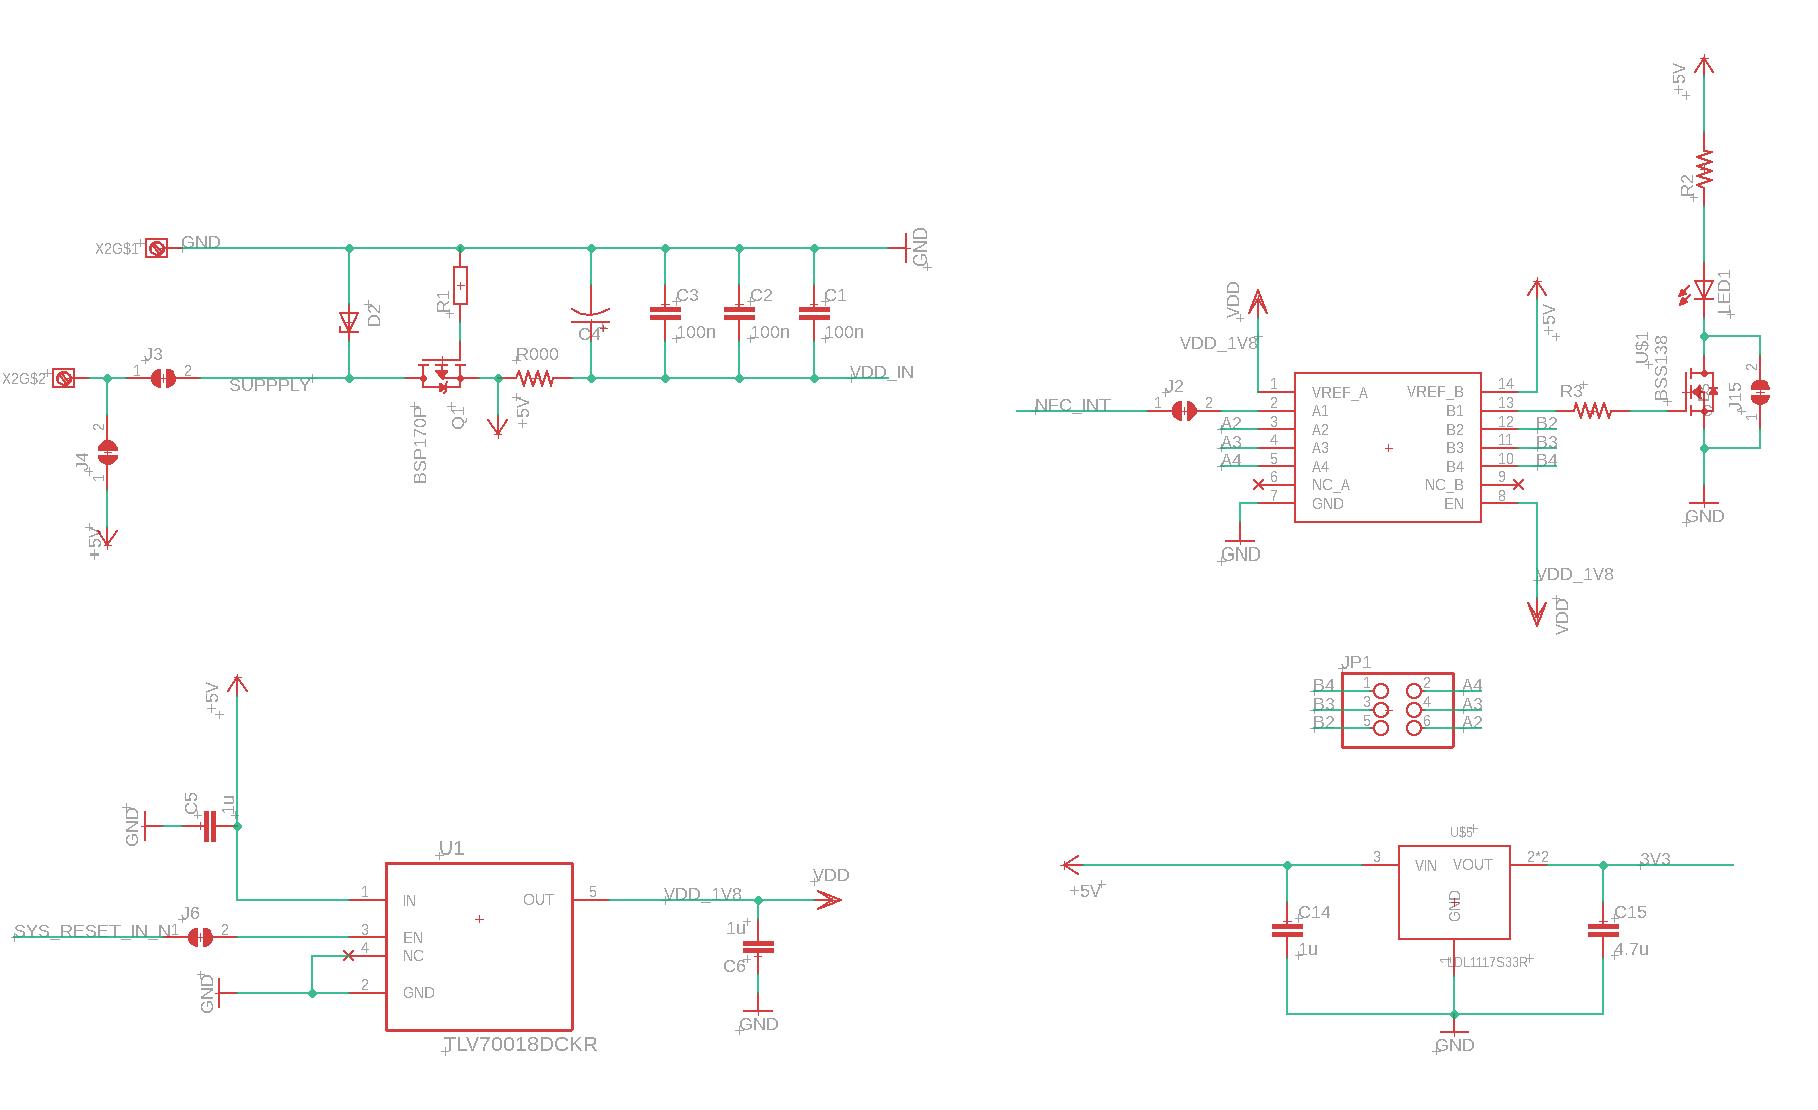 Celus export designs to CAD tools